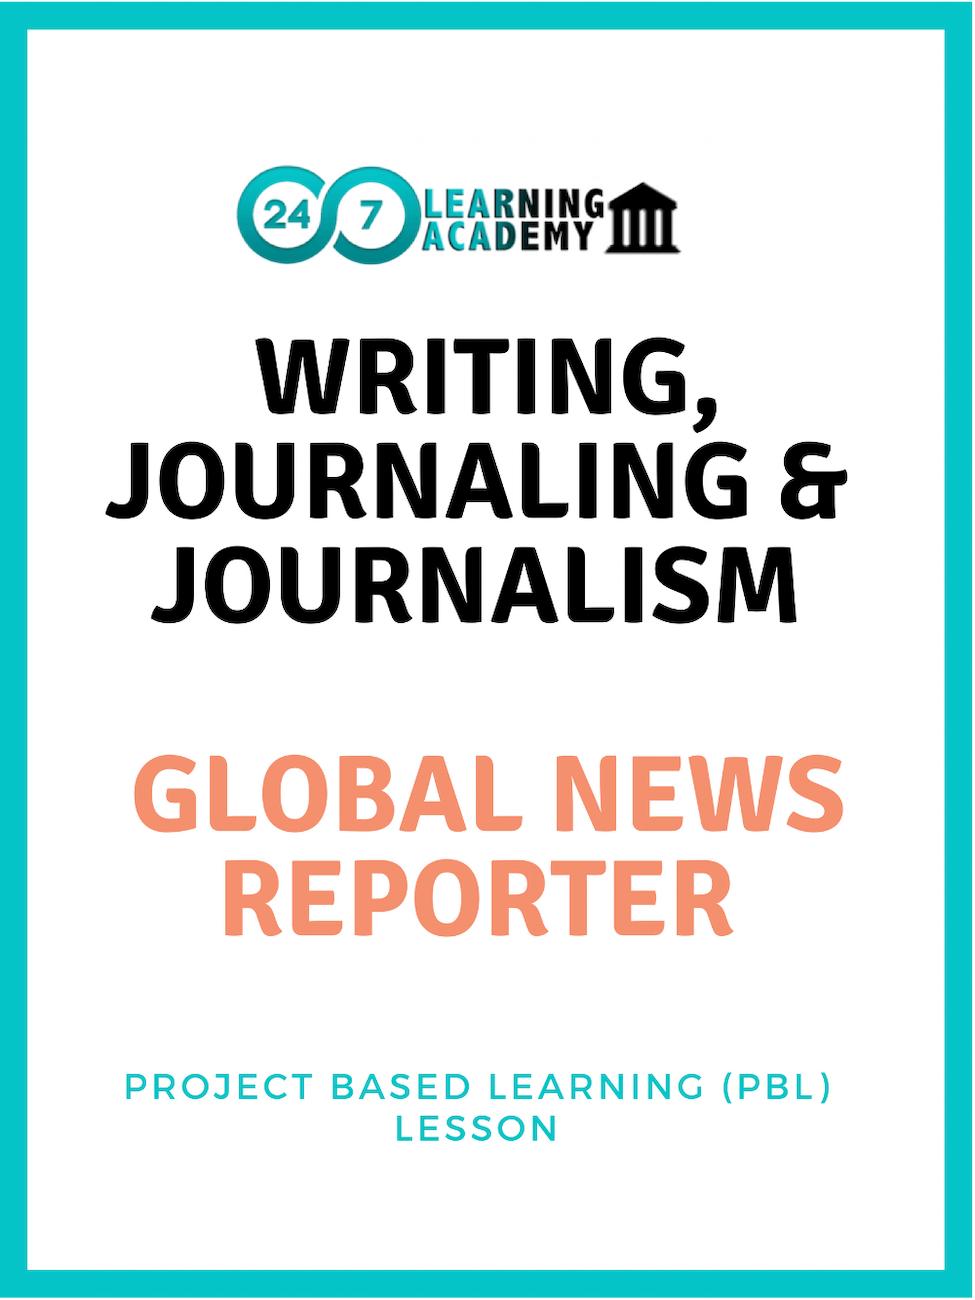 WritingandJournalism.png